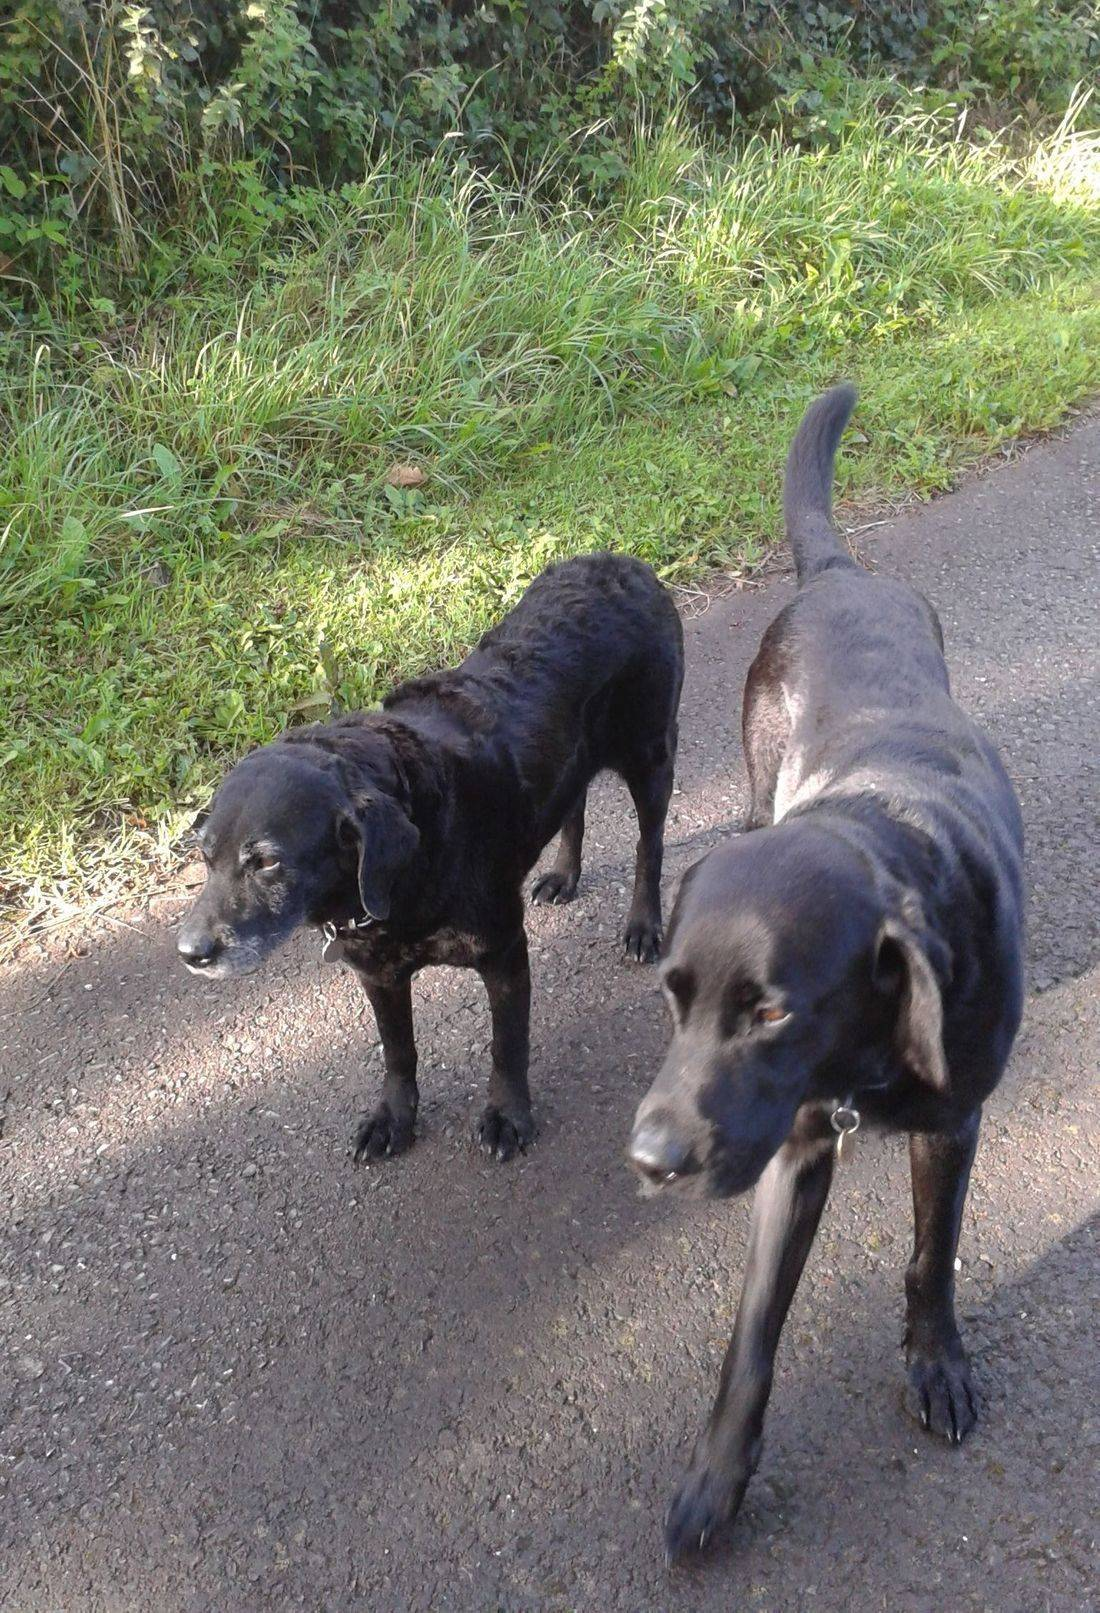 Black labradors strolling along